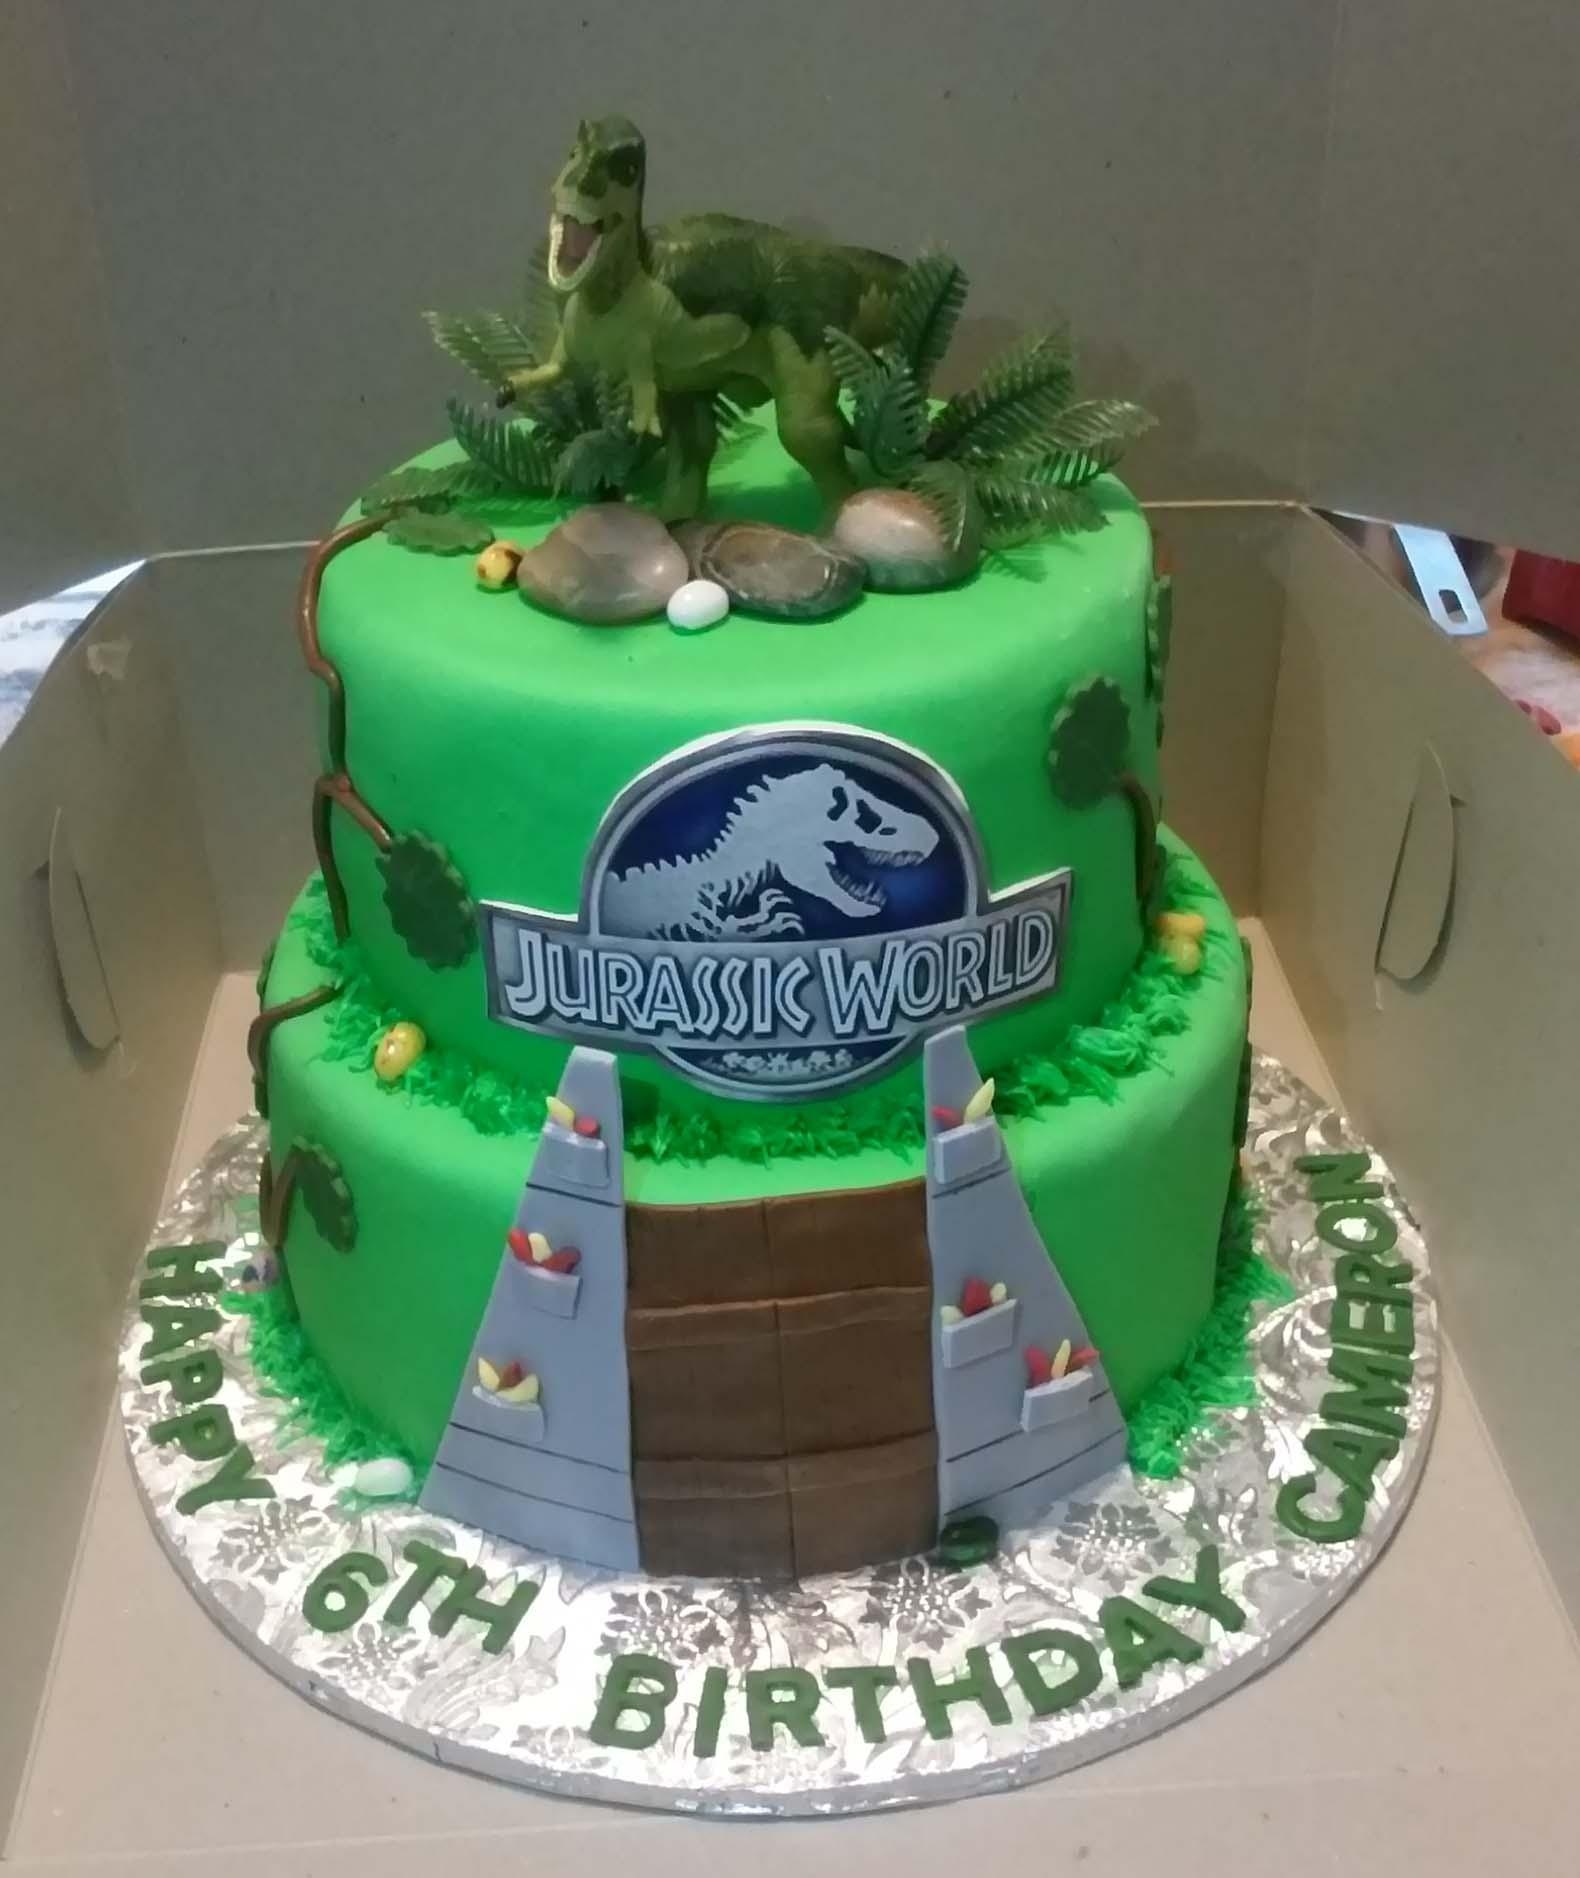 2 Tier Jurassic World Themed Birthday Cake